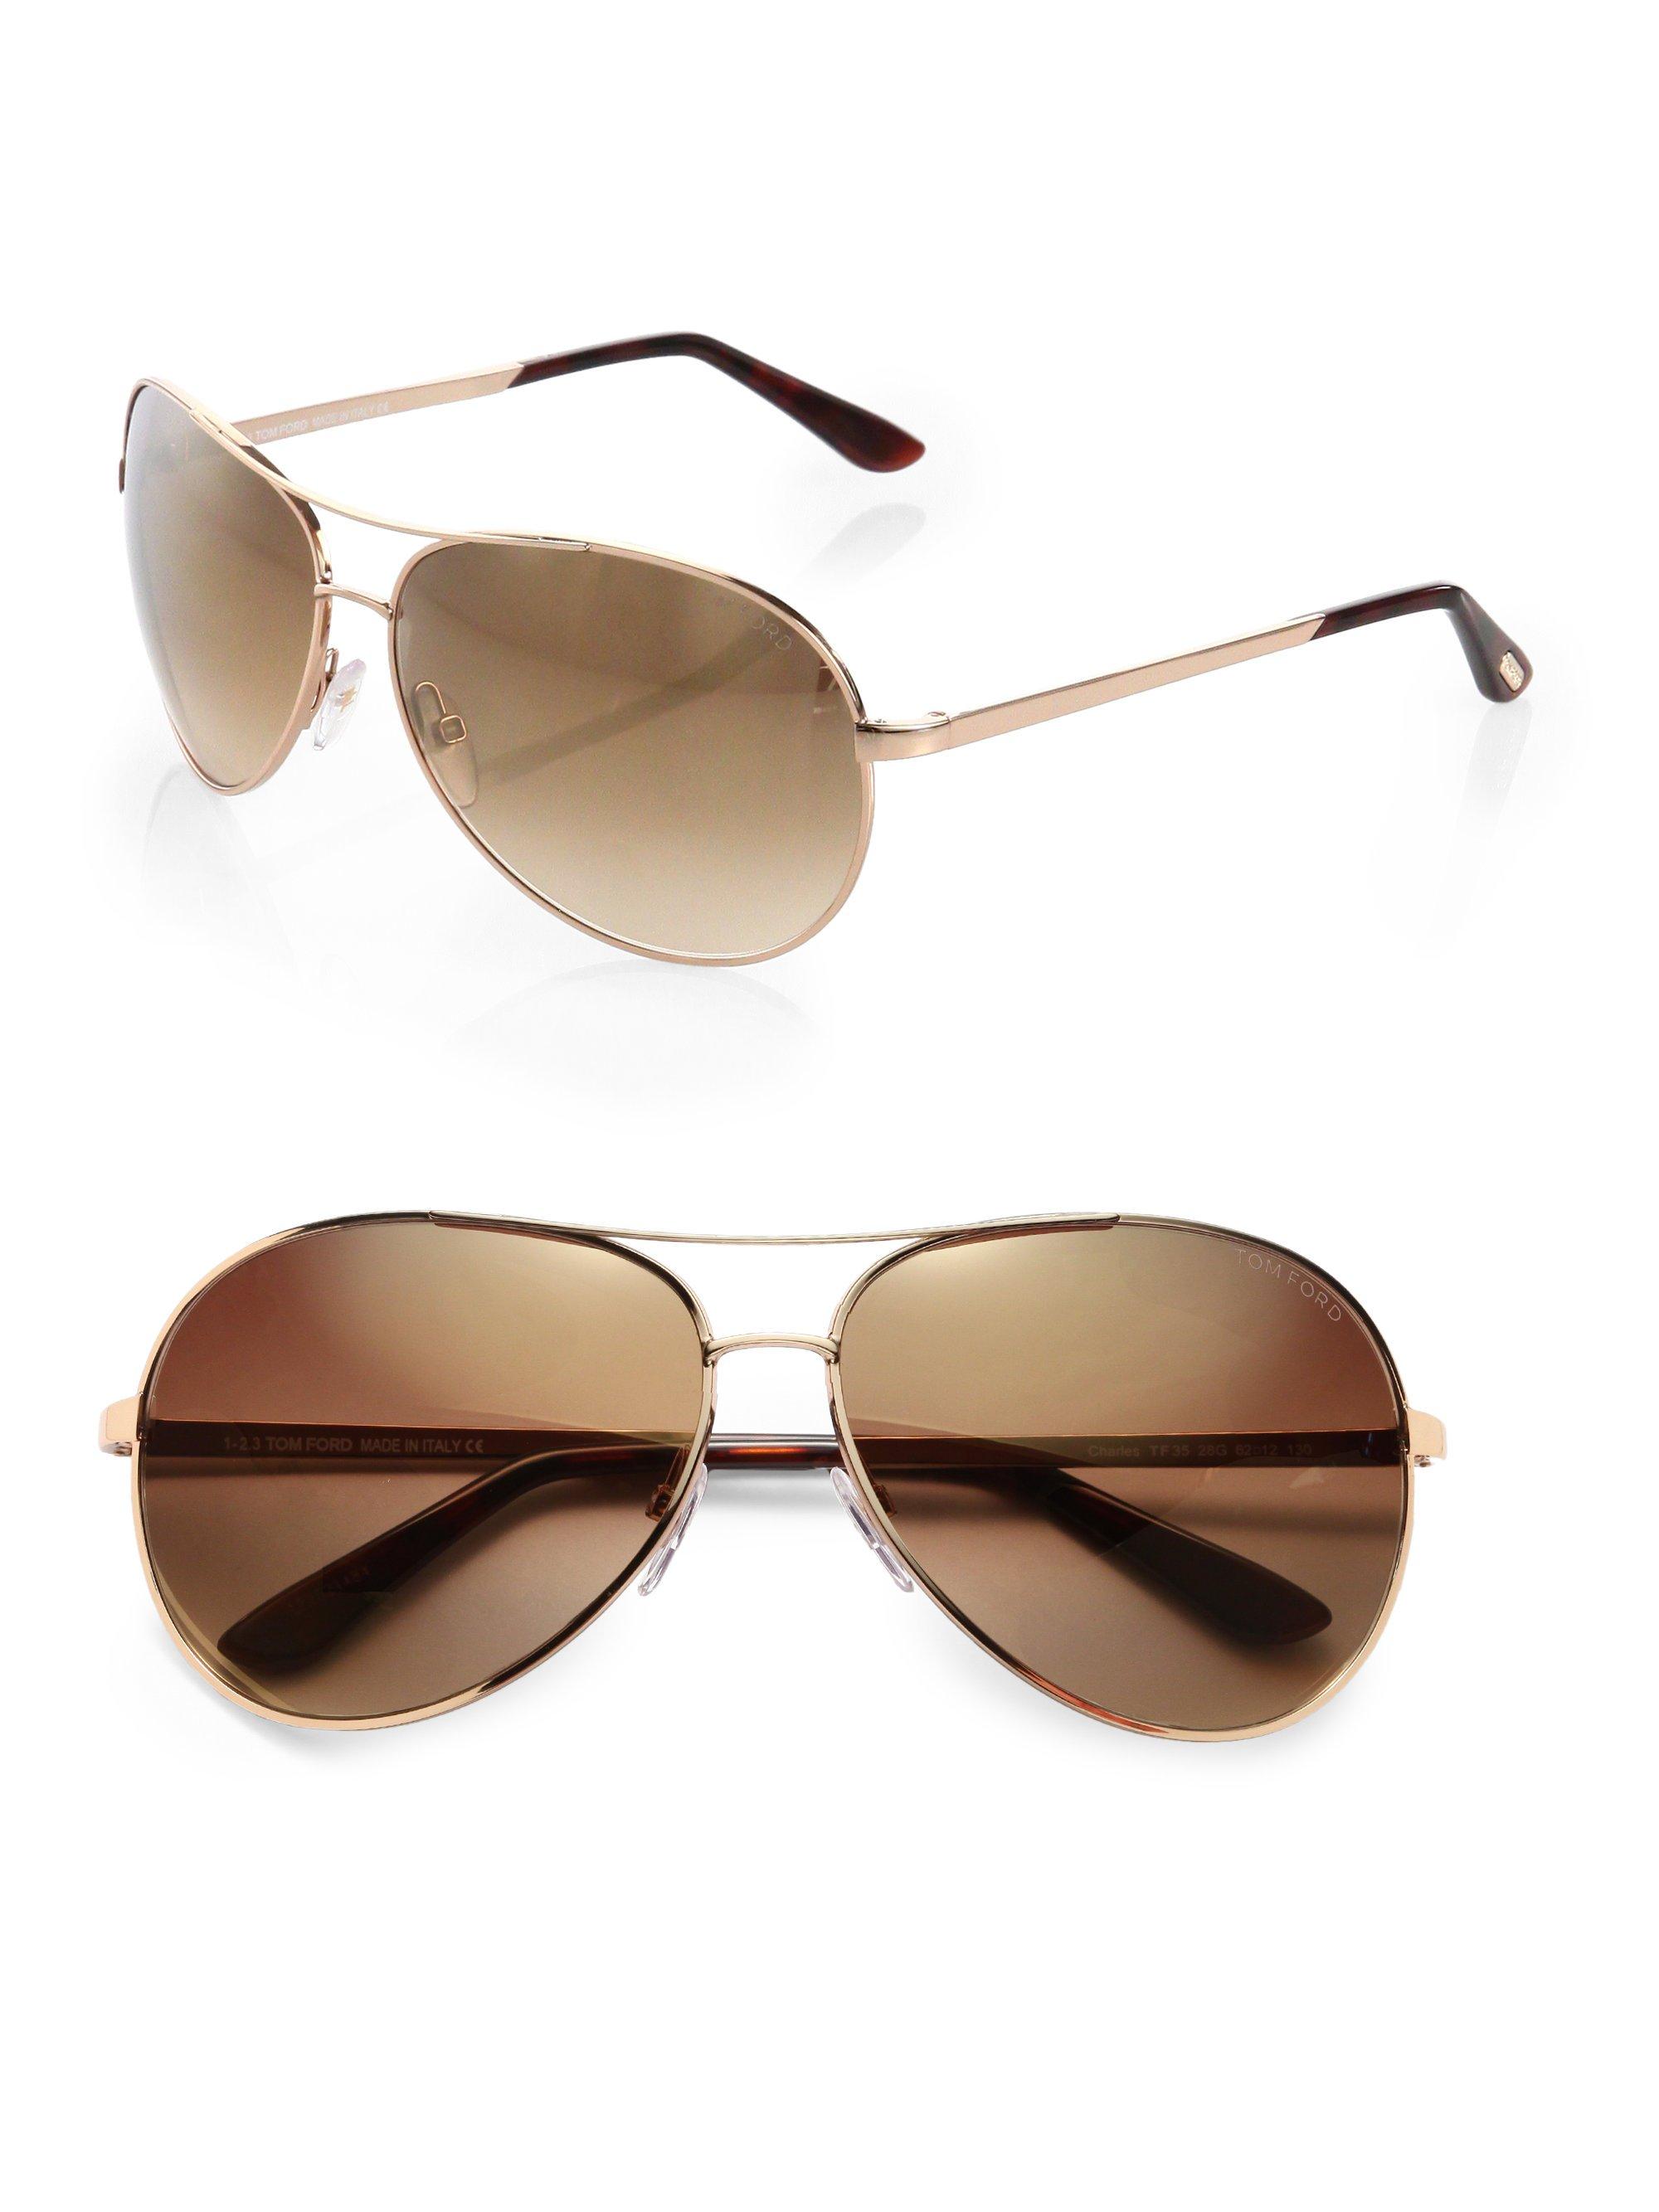 028c275c1b12 Tom Ford Maximillion Aviator Sunglasses Shiny Blue « One More Soul